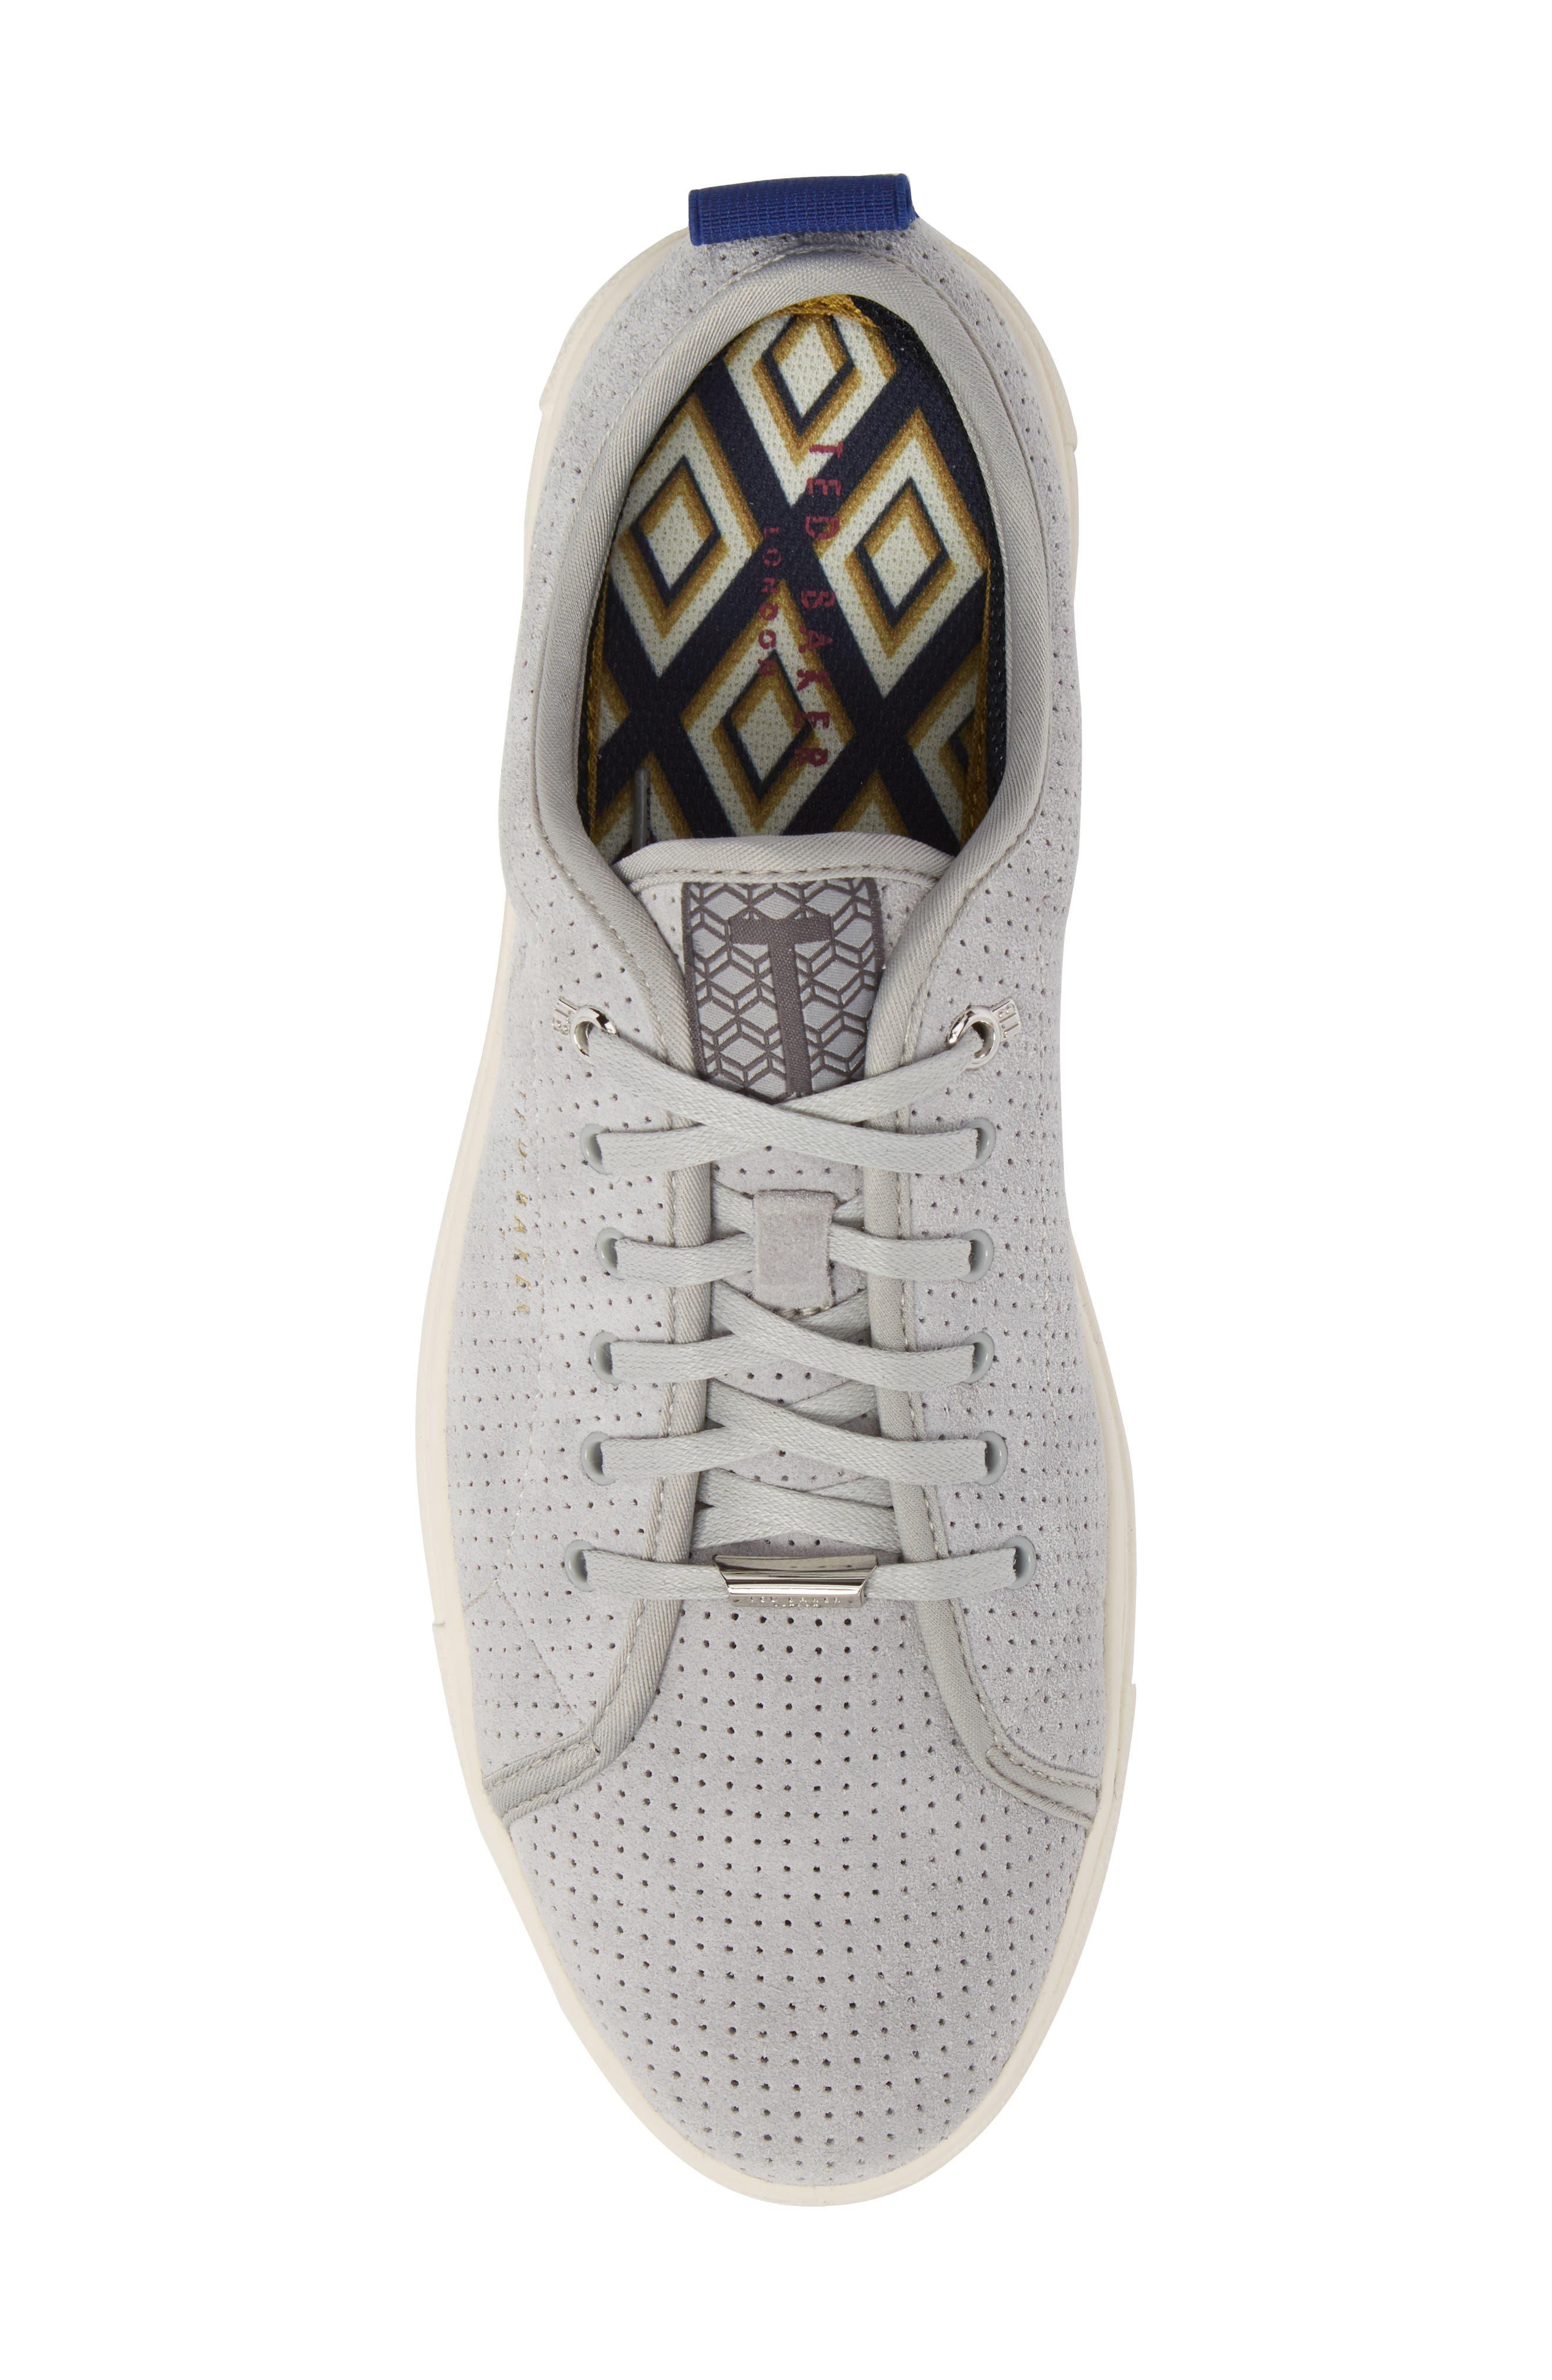 Kaliix Perforated Low Top Sneaker,                             Alternate thumbnail 5, color,                             070